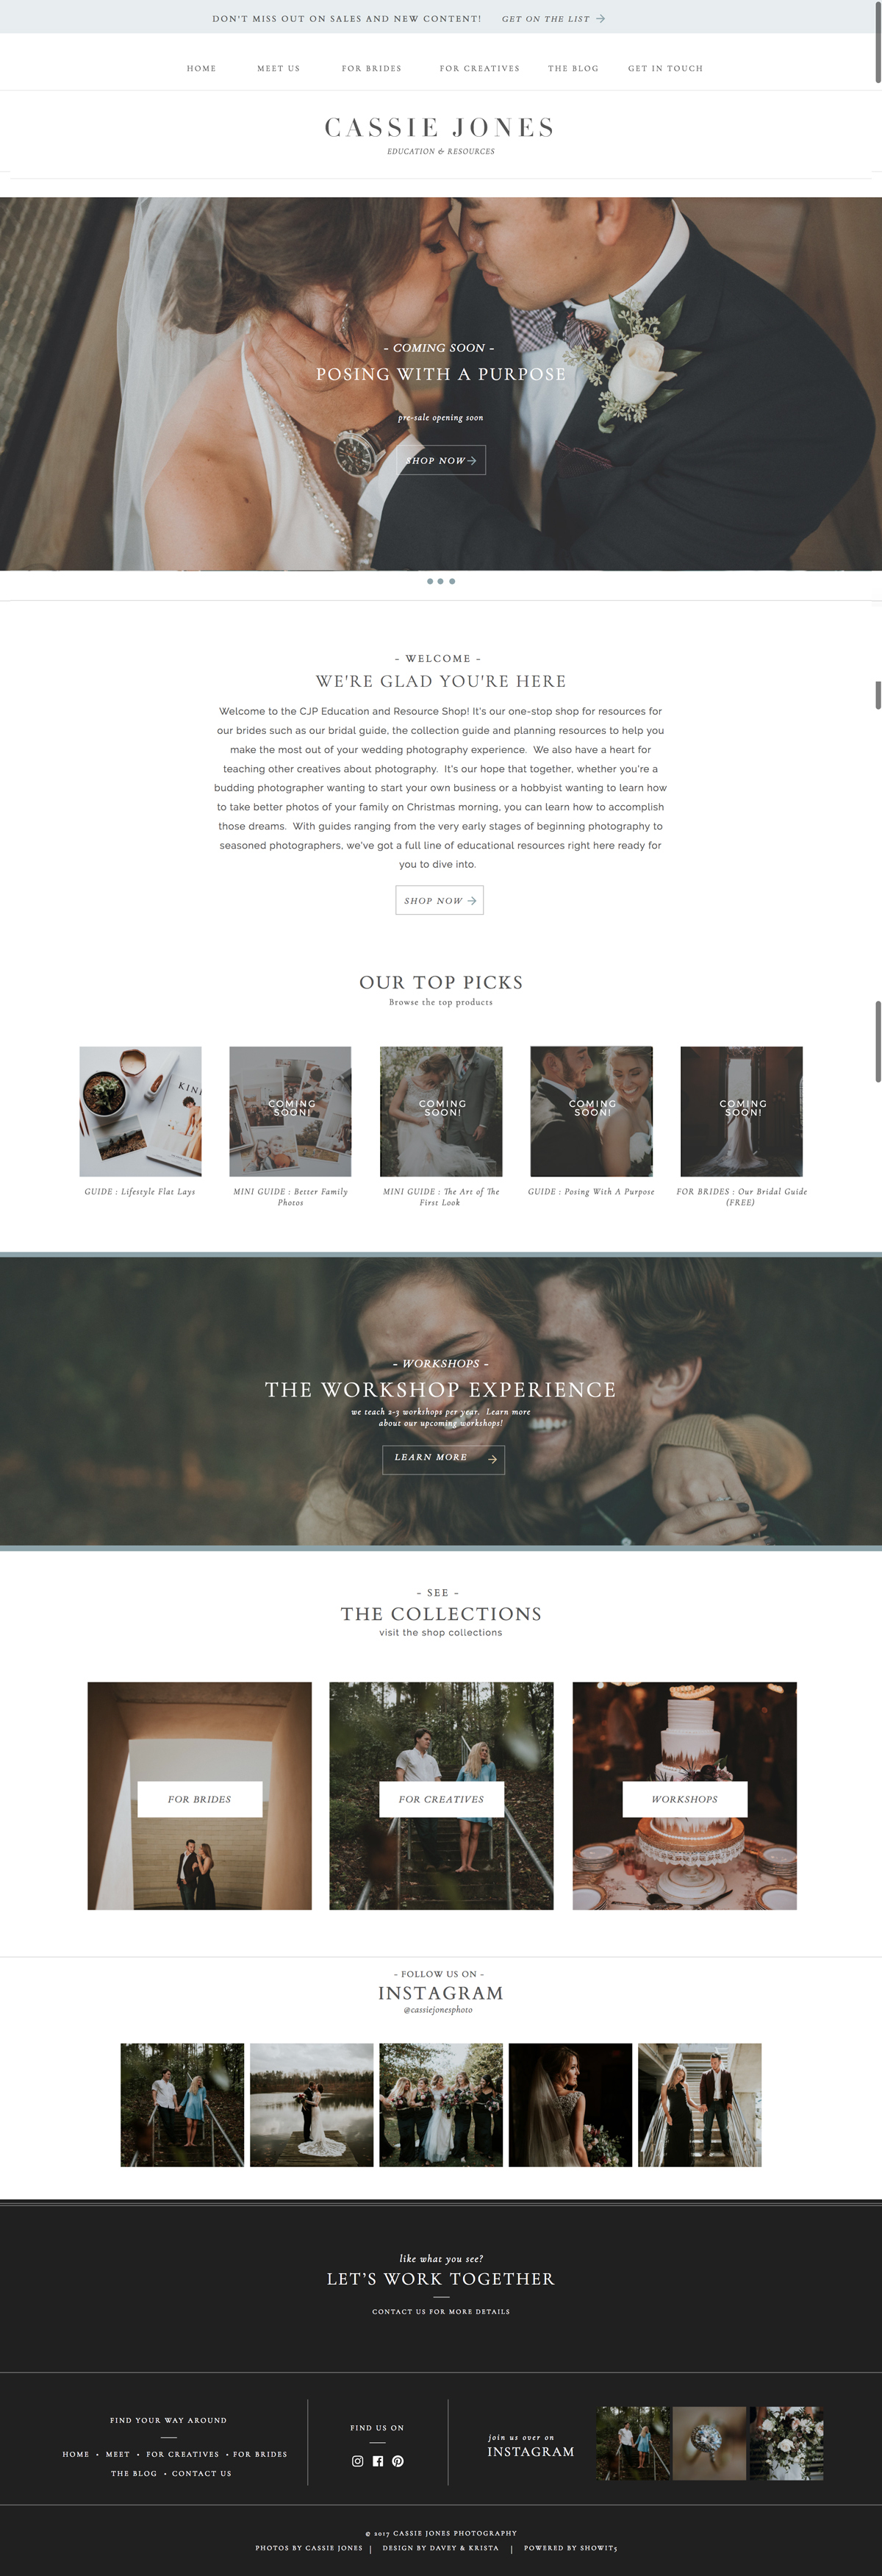 Classic, minimalist, website template for photographer Cassie Jones | Davey & Krista